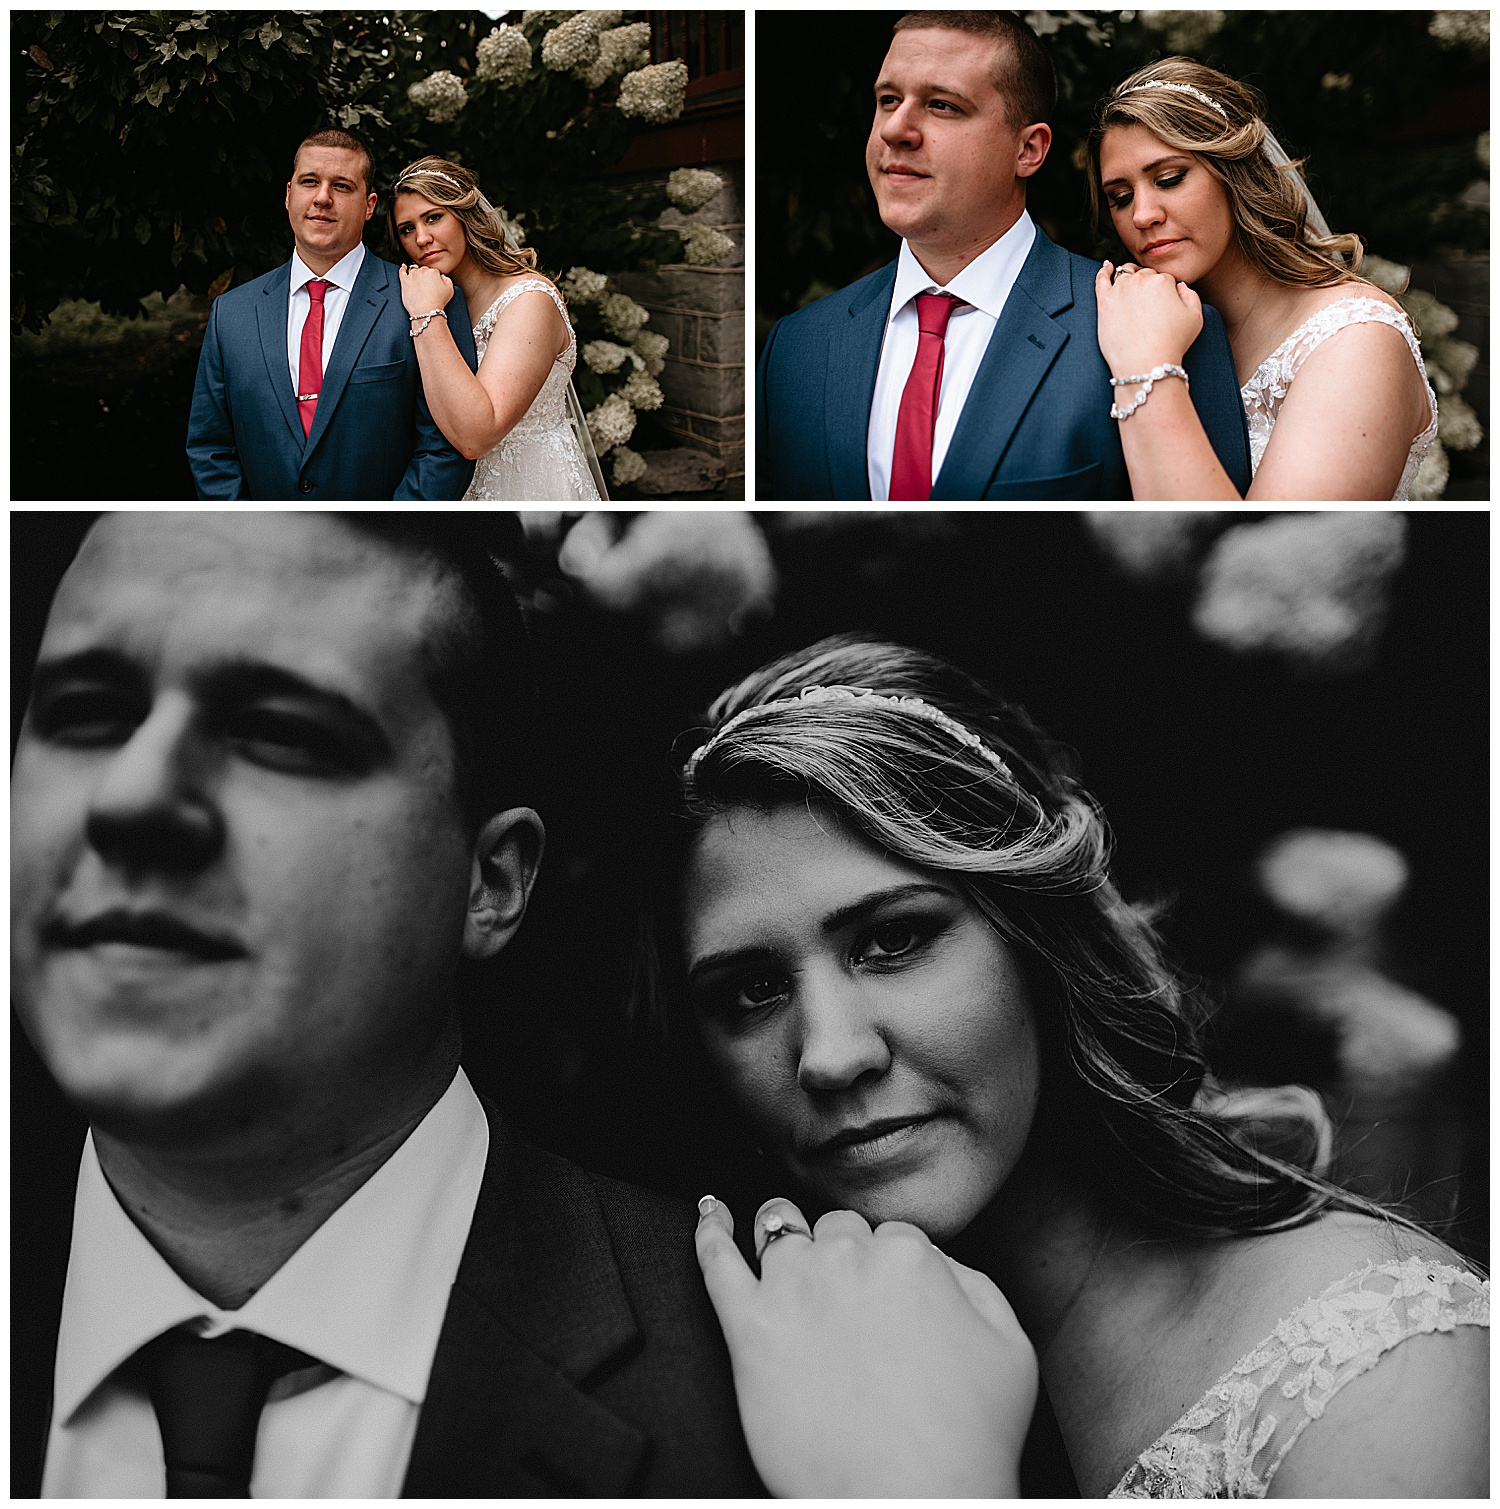 NEPA-Bloomgsburg-Wedding-Photographer-at-The-Barn-at-Greystone-Farms-Watsontown-PA_0036.jpg